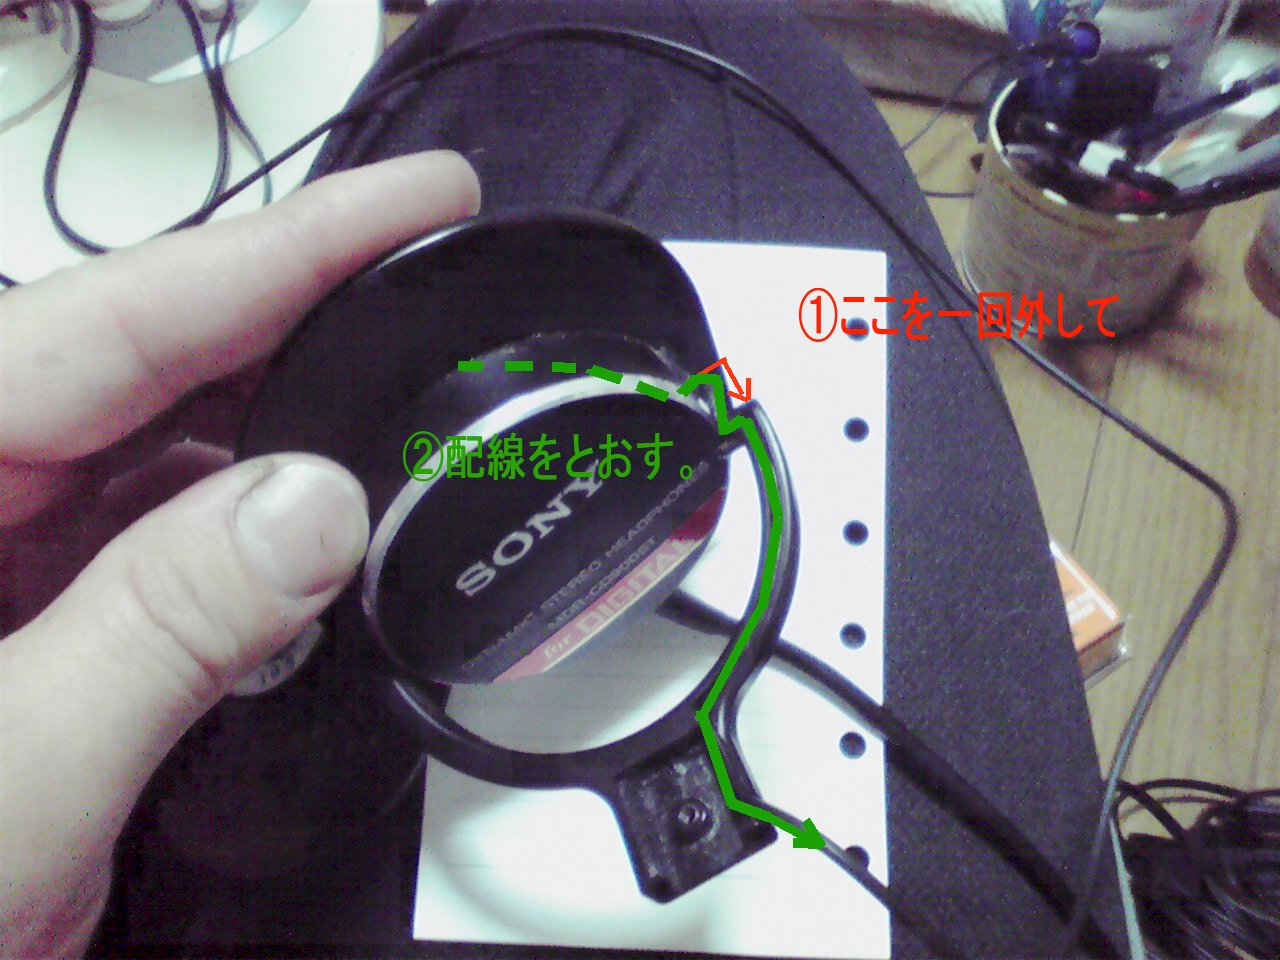 MDR-CD900ST R断線lリケーブル03